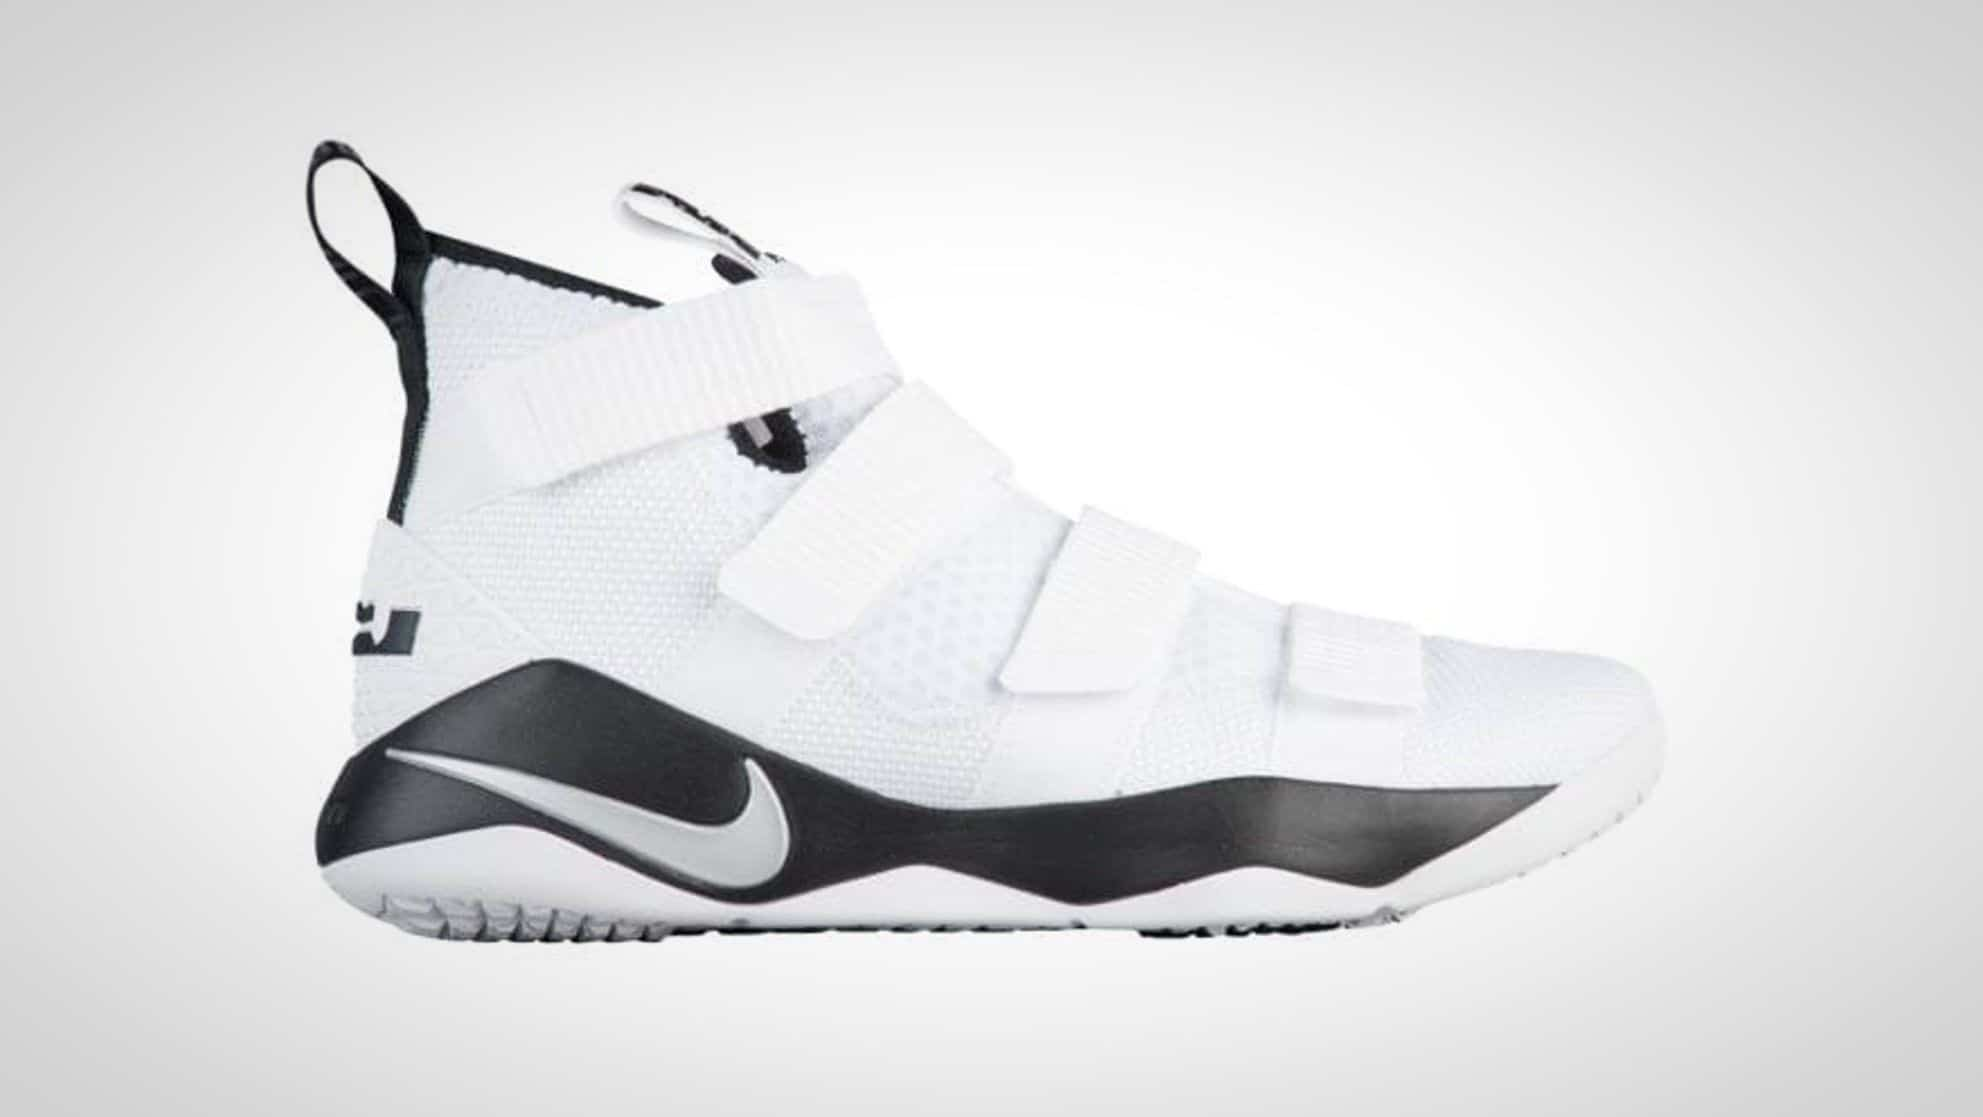 b1d0095ed986 Nike Lebron Soldier 11 Basketball Shoe Review - BestOutdoorBasketball